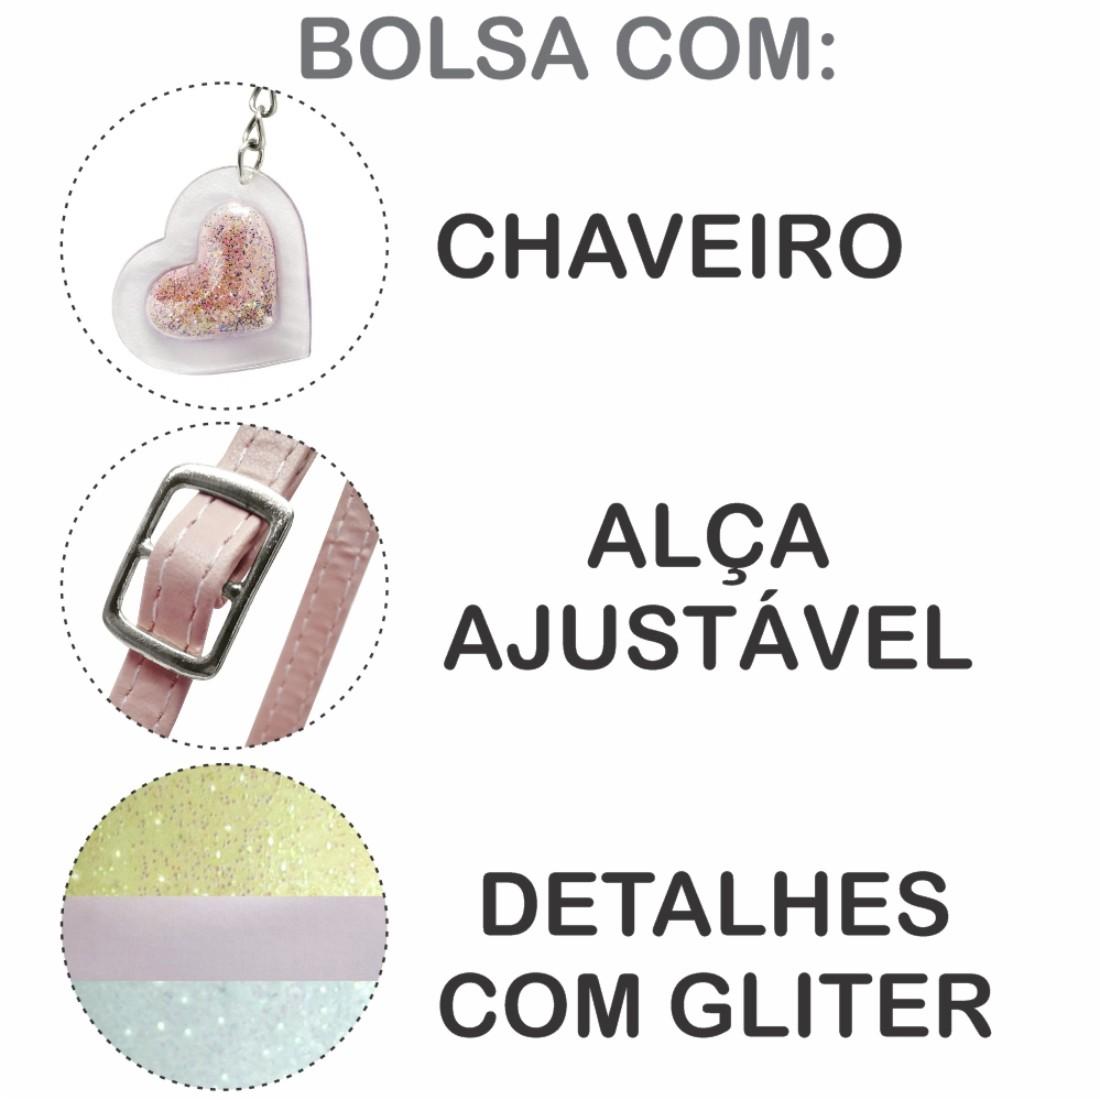 Kit Infantil Sapatilha, Bolsa e Estojo Listra Colorida Corações, Magicc Kids